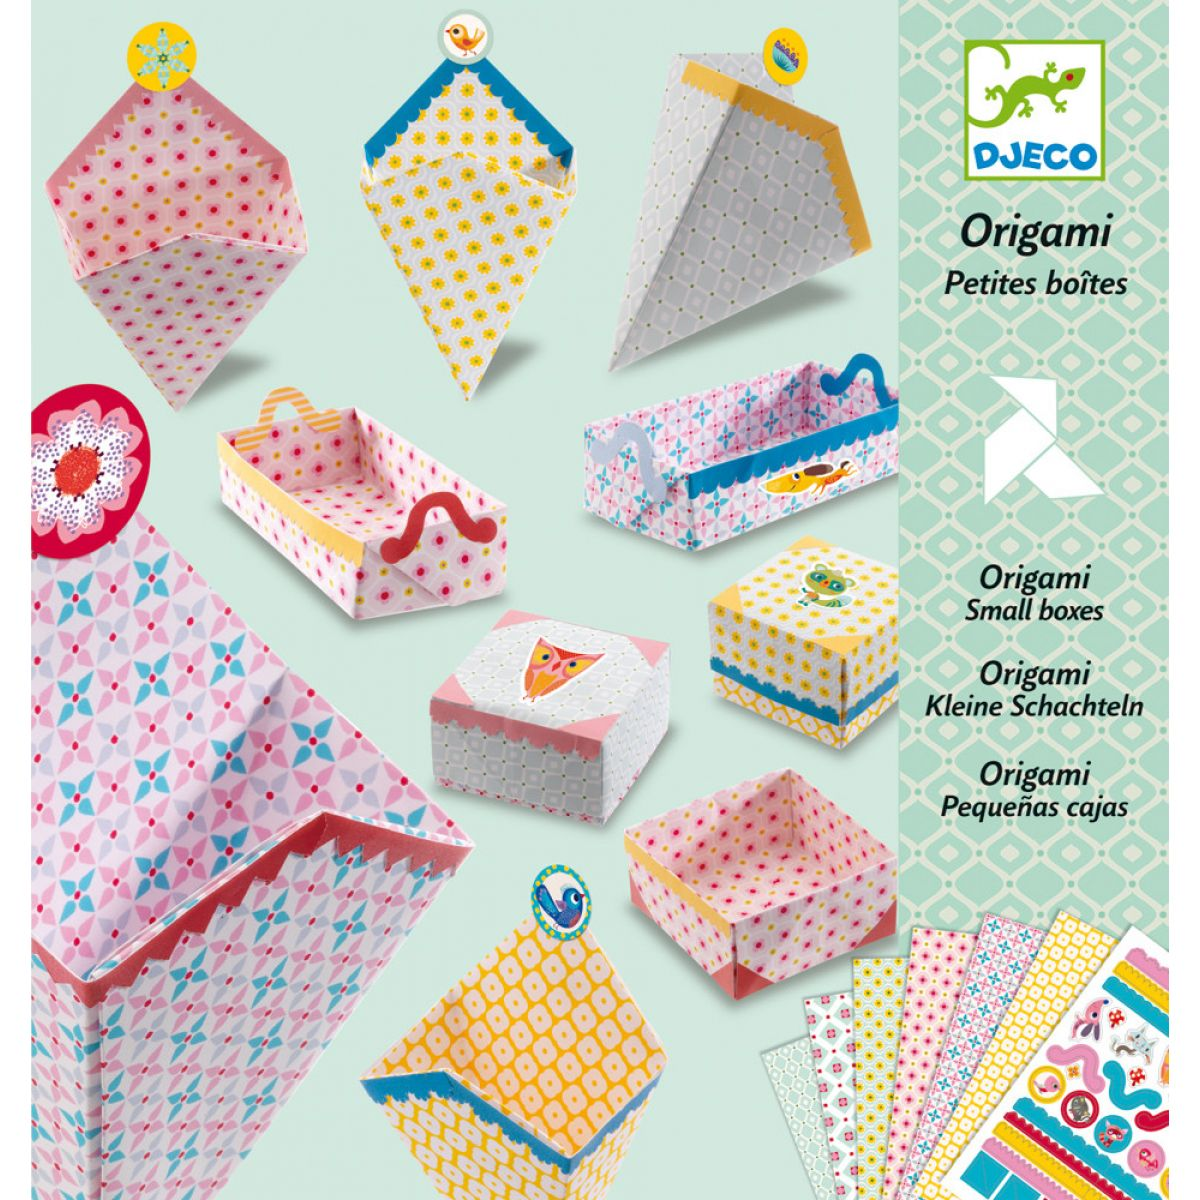 Djeco Origami skládačka Krabičky